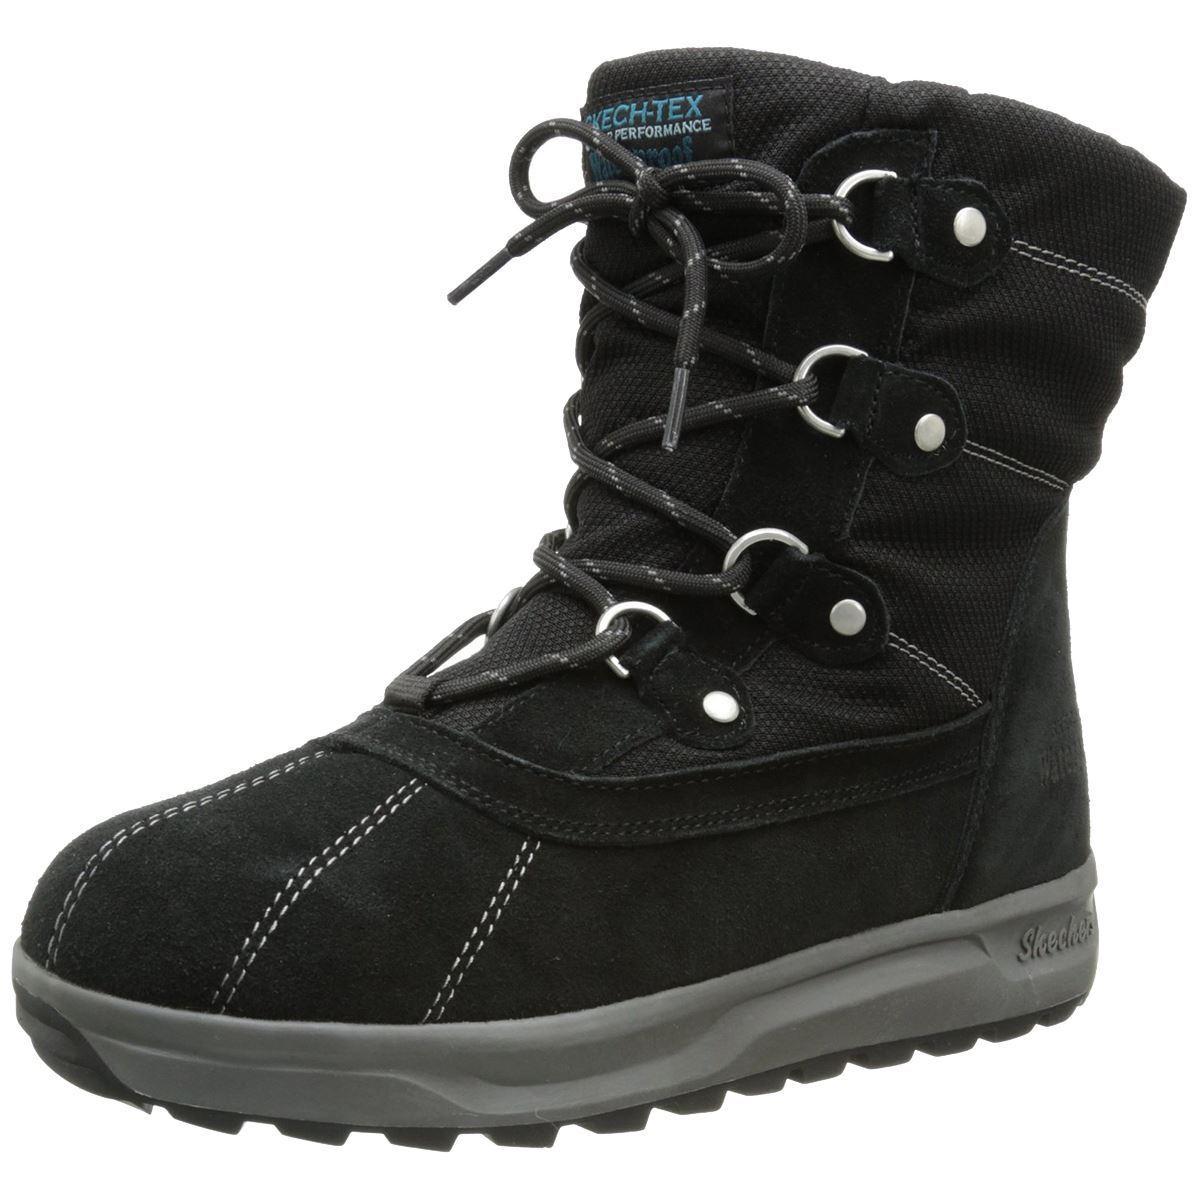 Skechers STORM CLOUD CUMULUS Womens Black Leather Waterproof Snow Winter Boots